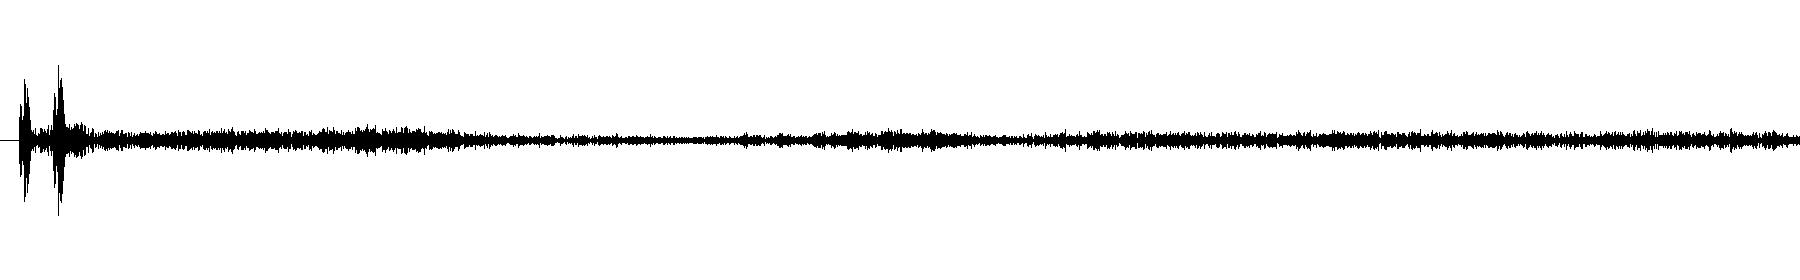 perc 1 57